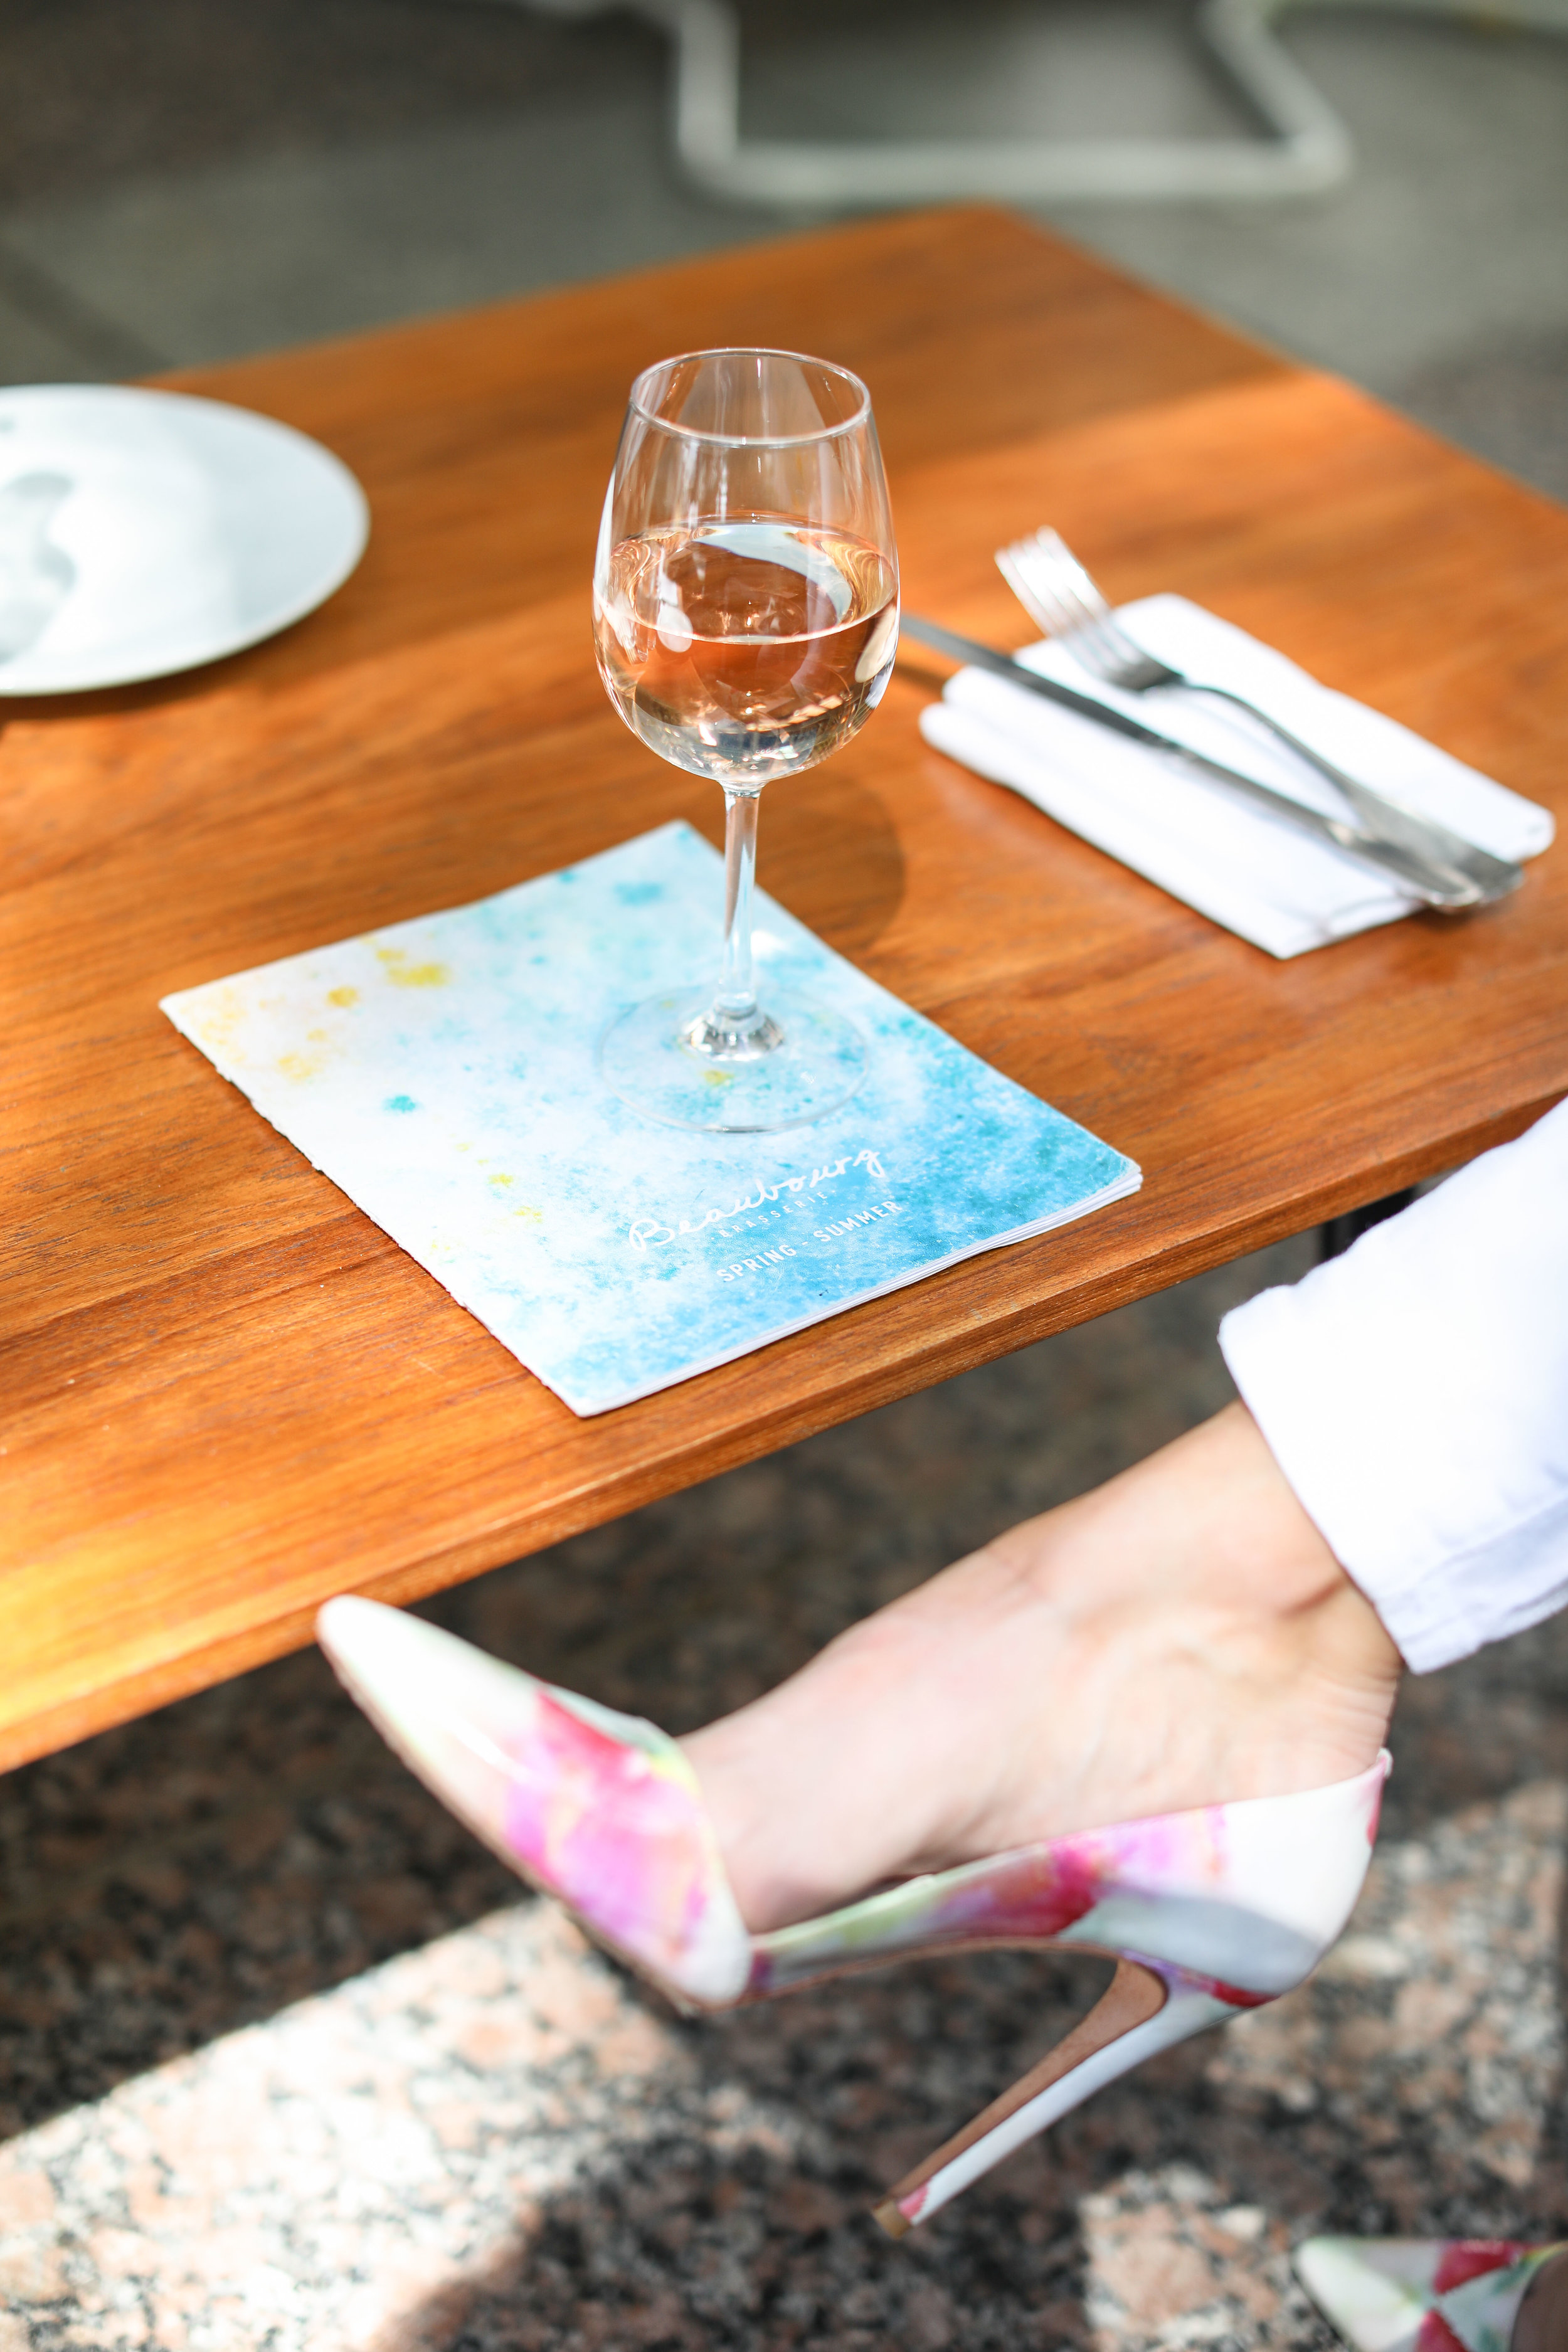 roseé wine